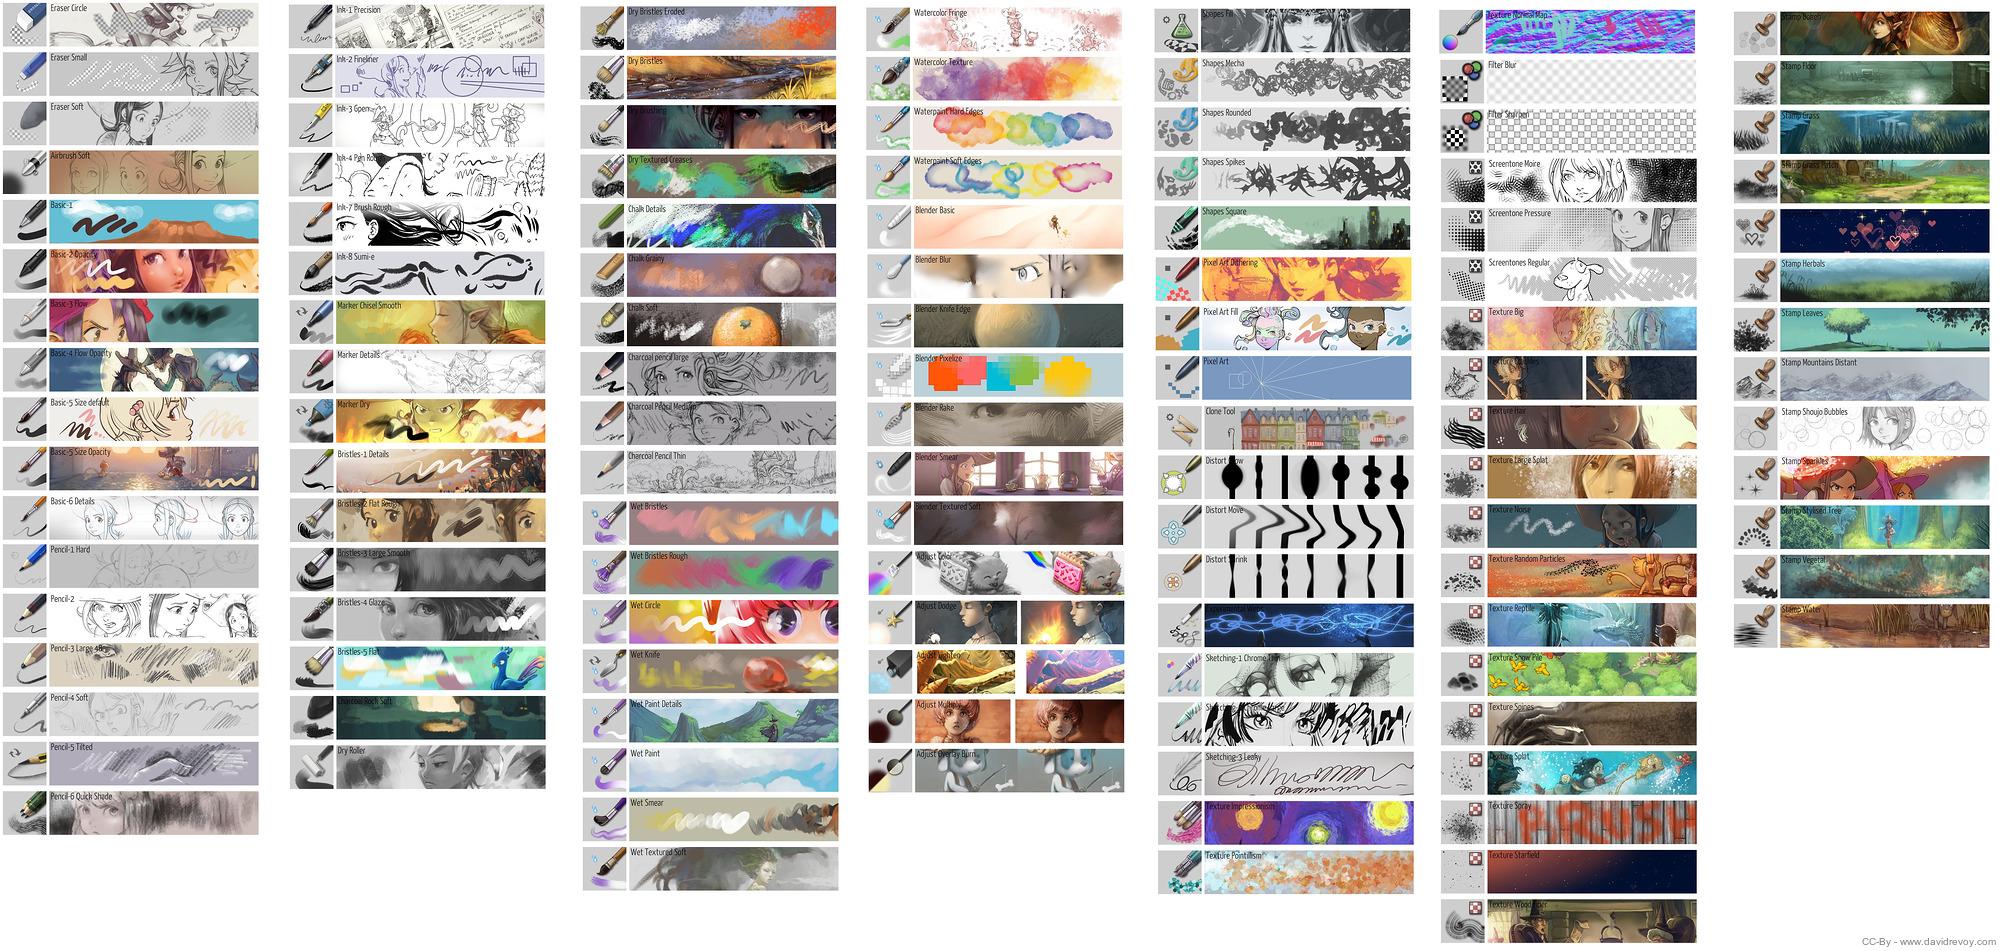 Krita 4 0 Brushes - David Revoy